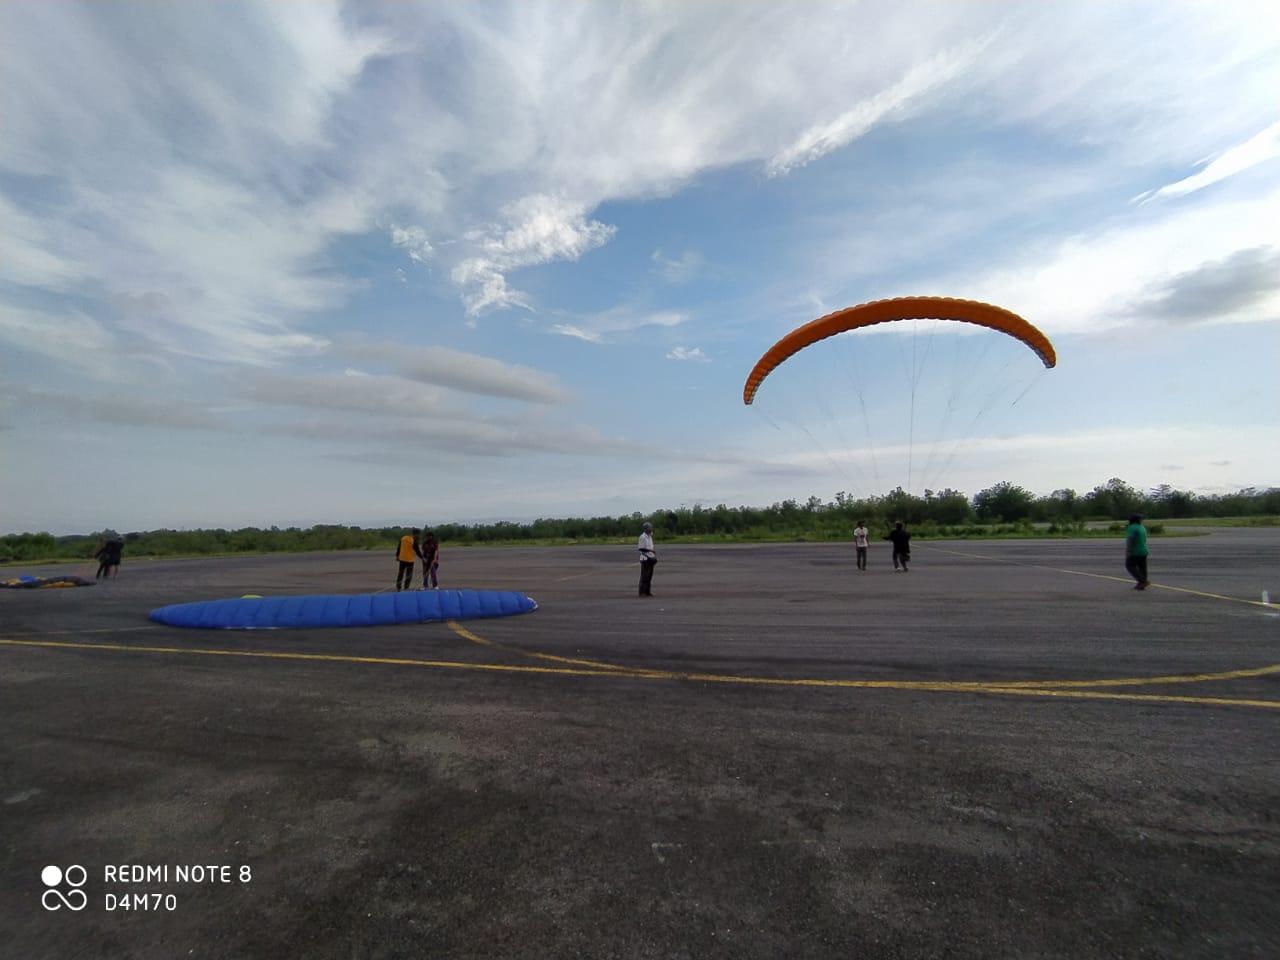 Belum Punya Atlet Paralayang, Dinas Pariwisata Berikan Pelatihan dan Cetak Atlet Profesional 157